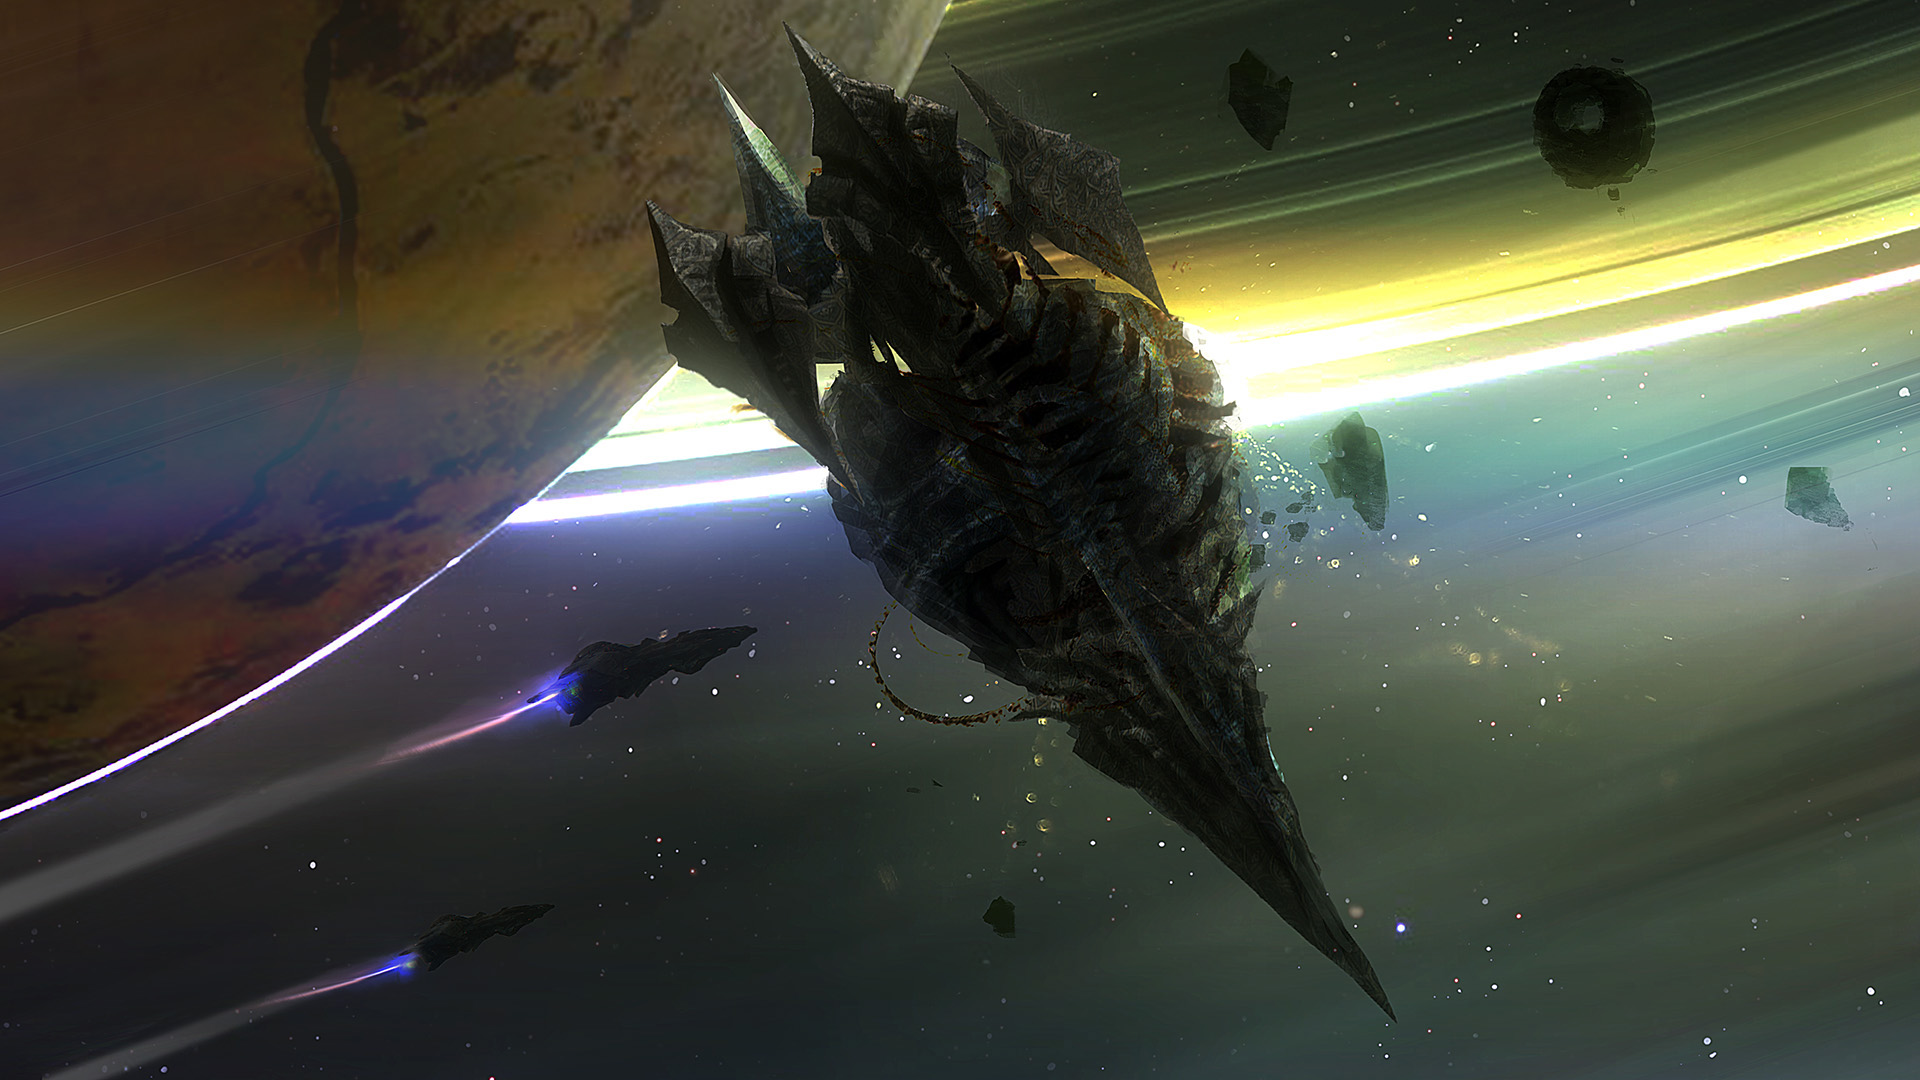 Alien artefact by moonxels